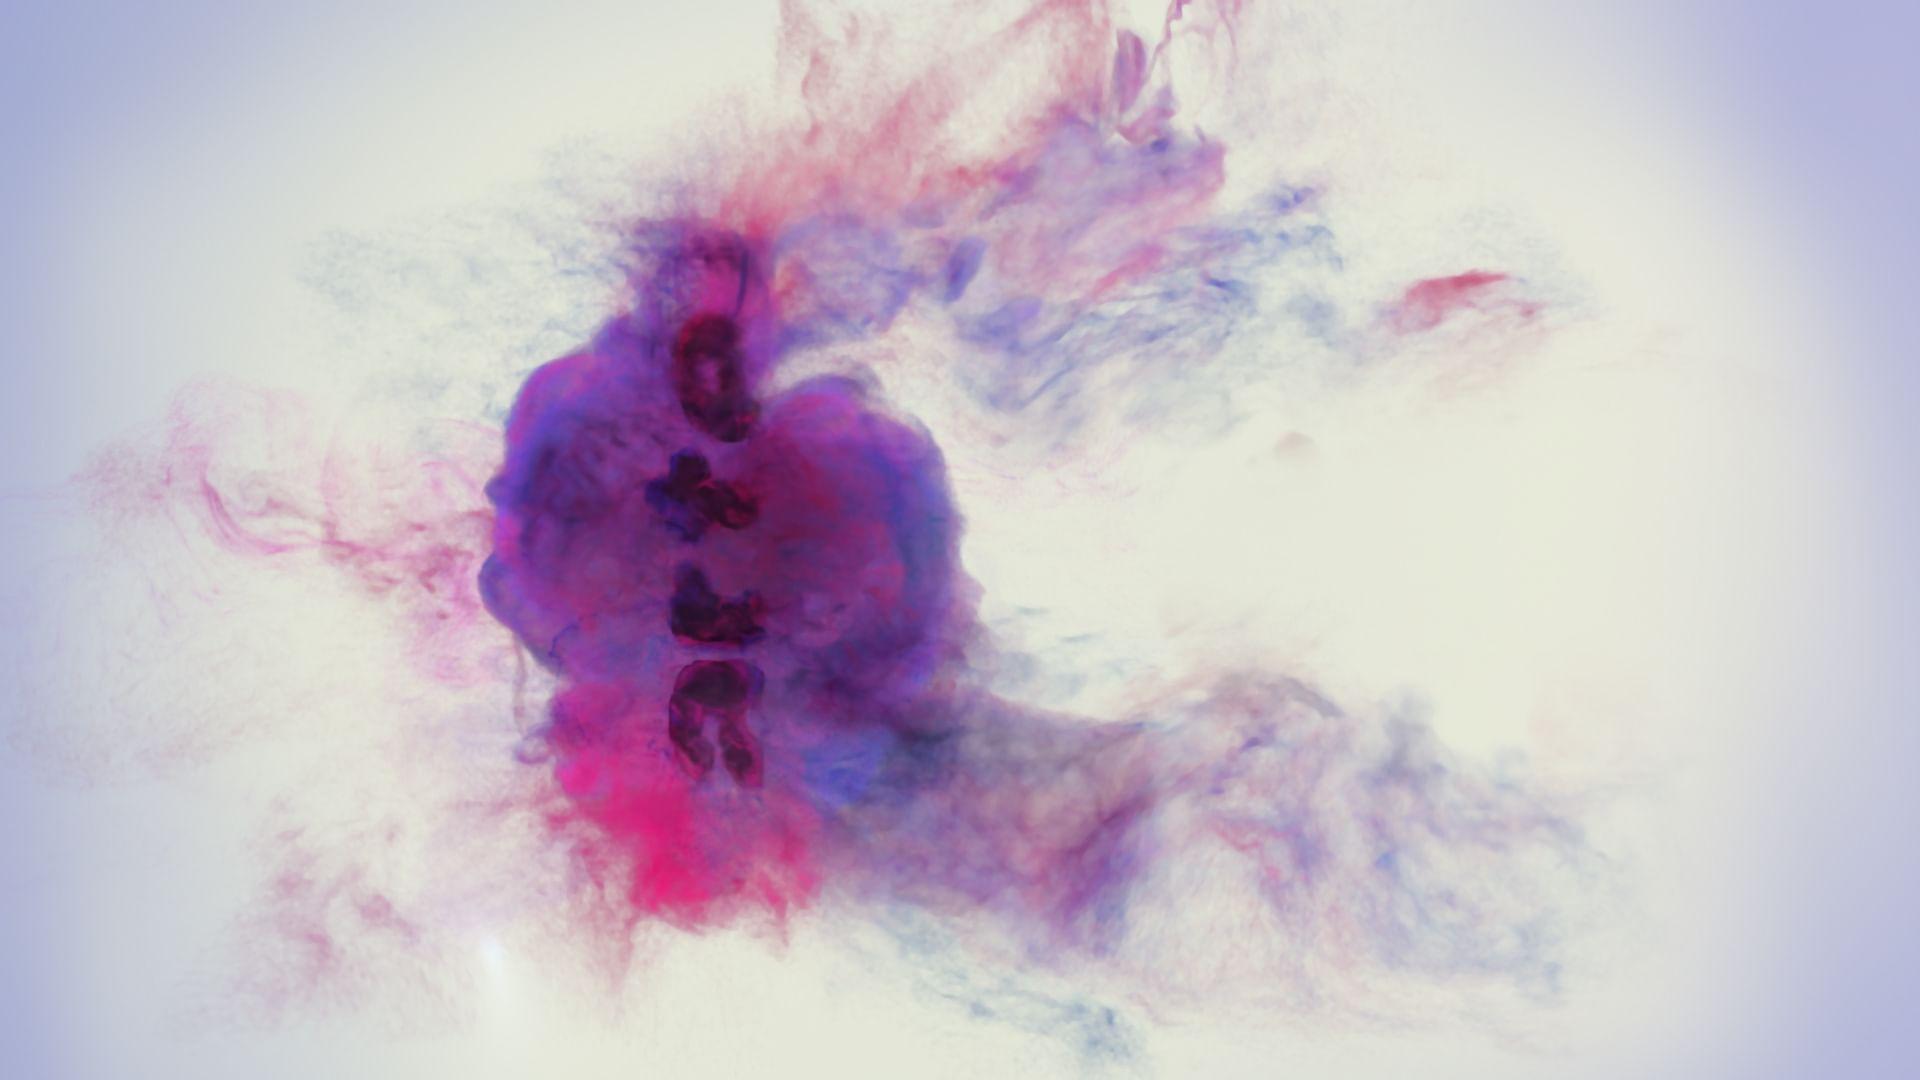 Sziget Festival 2017 - Island Of Freedom - Island Of Freedom